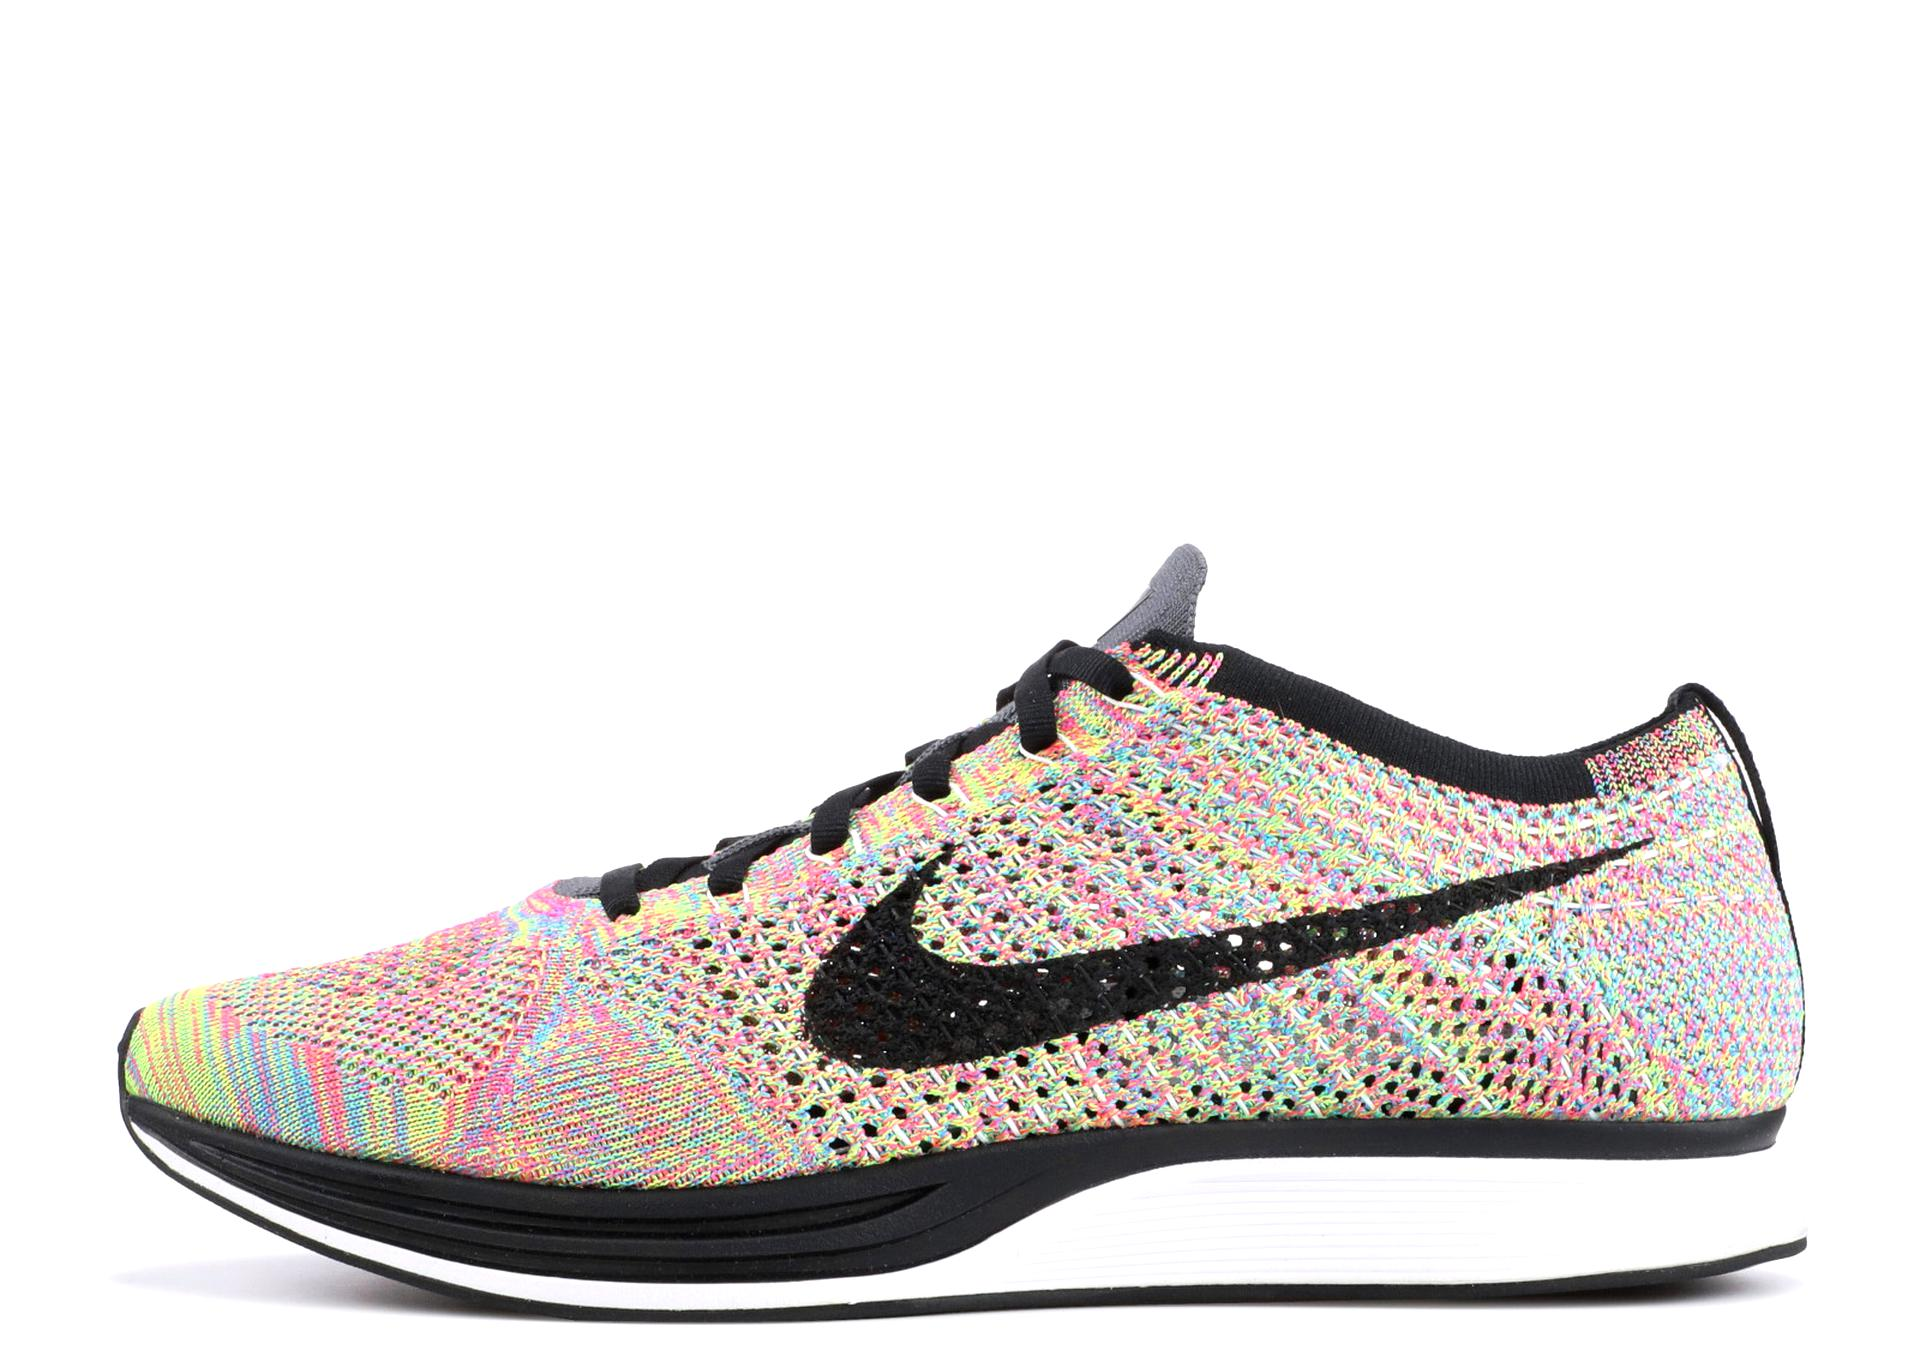 Détails sur Nike Air Max 1 Ultra Flyknit Homme Running Baskets 856958 203 Baskets Chaussures afficher le titre d'origine